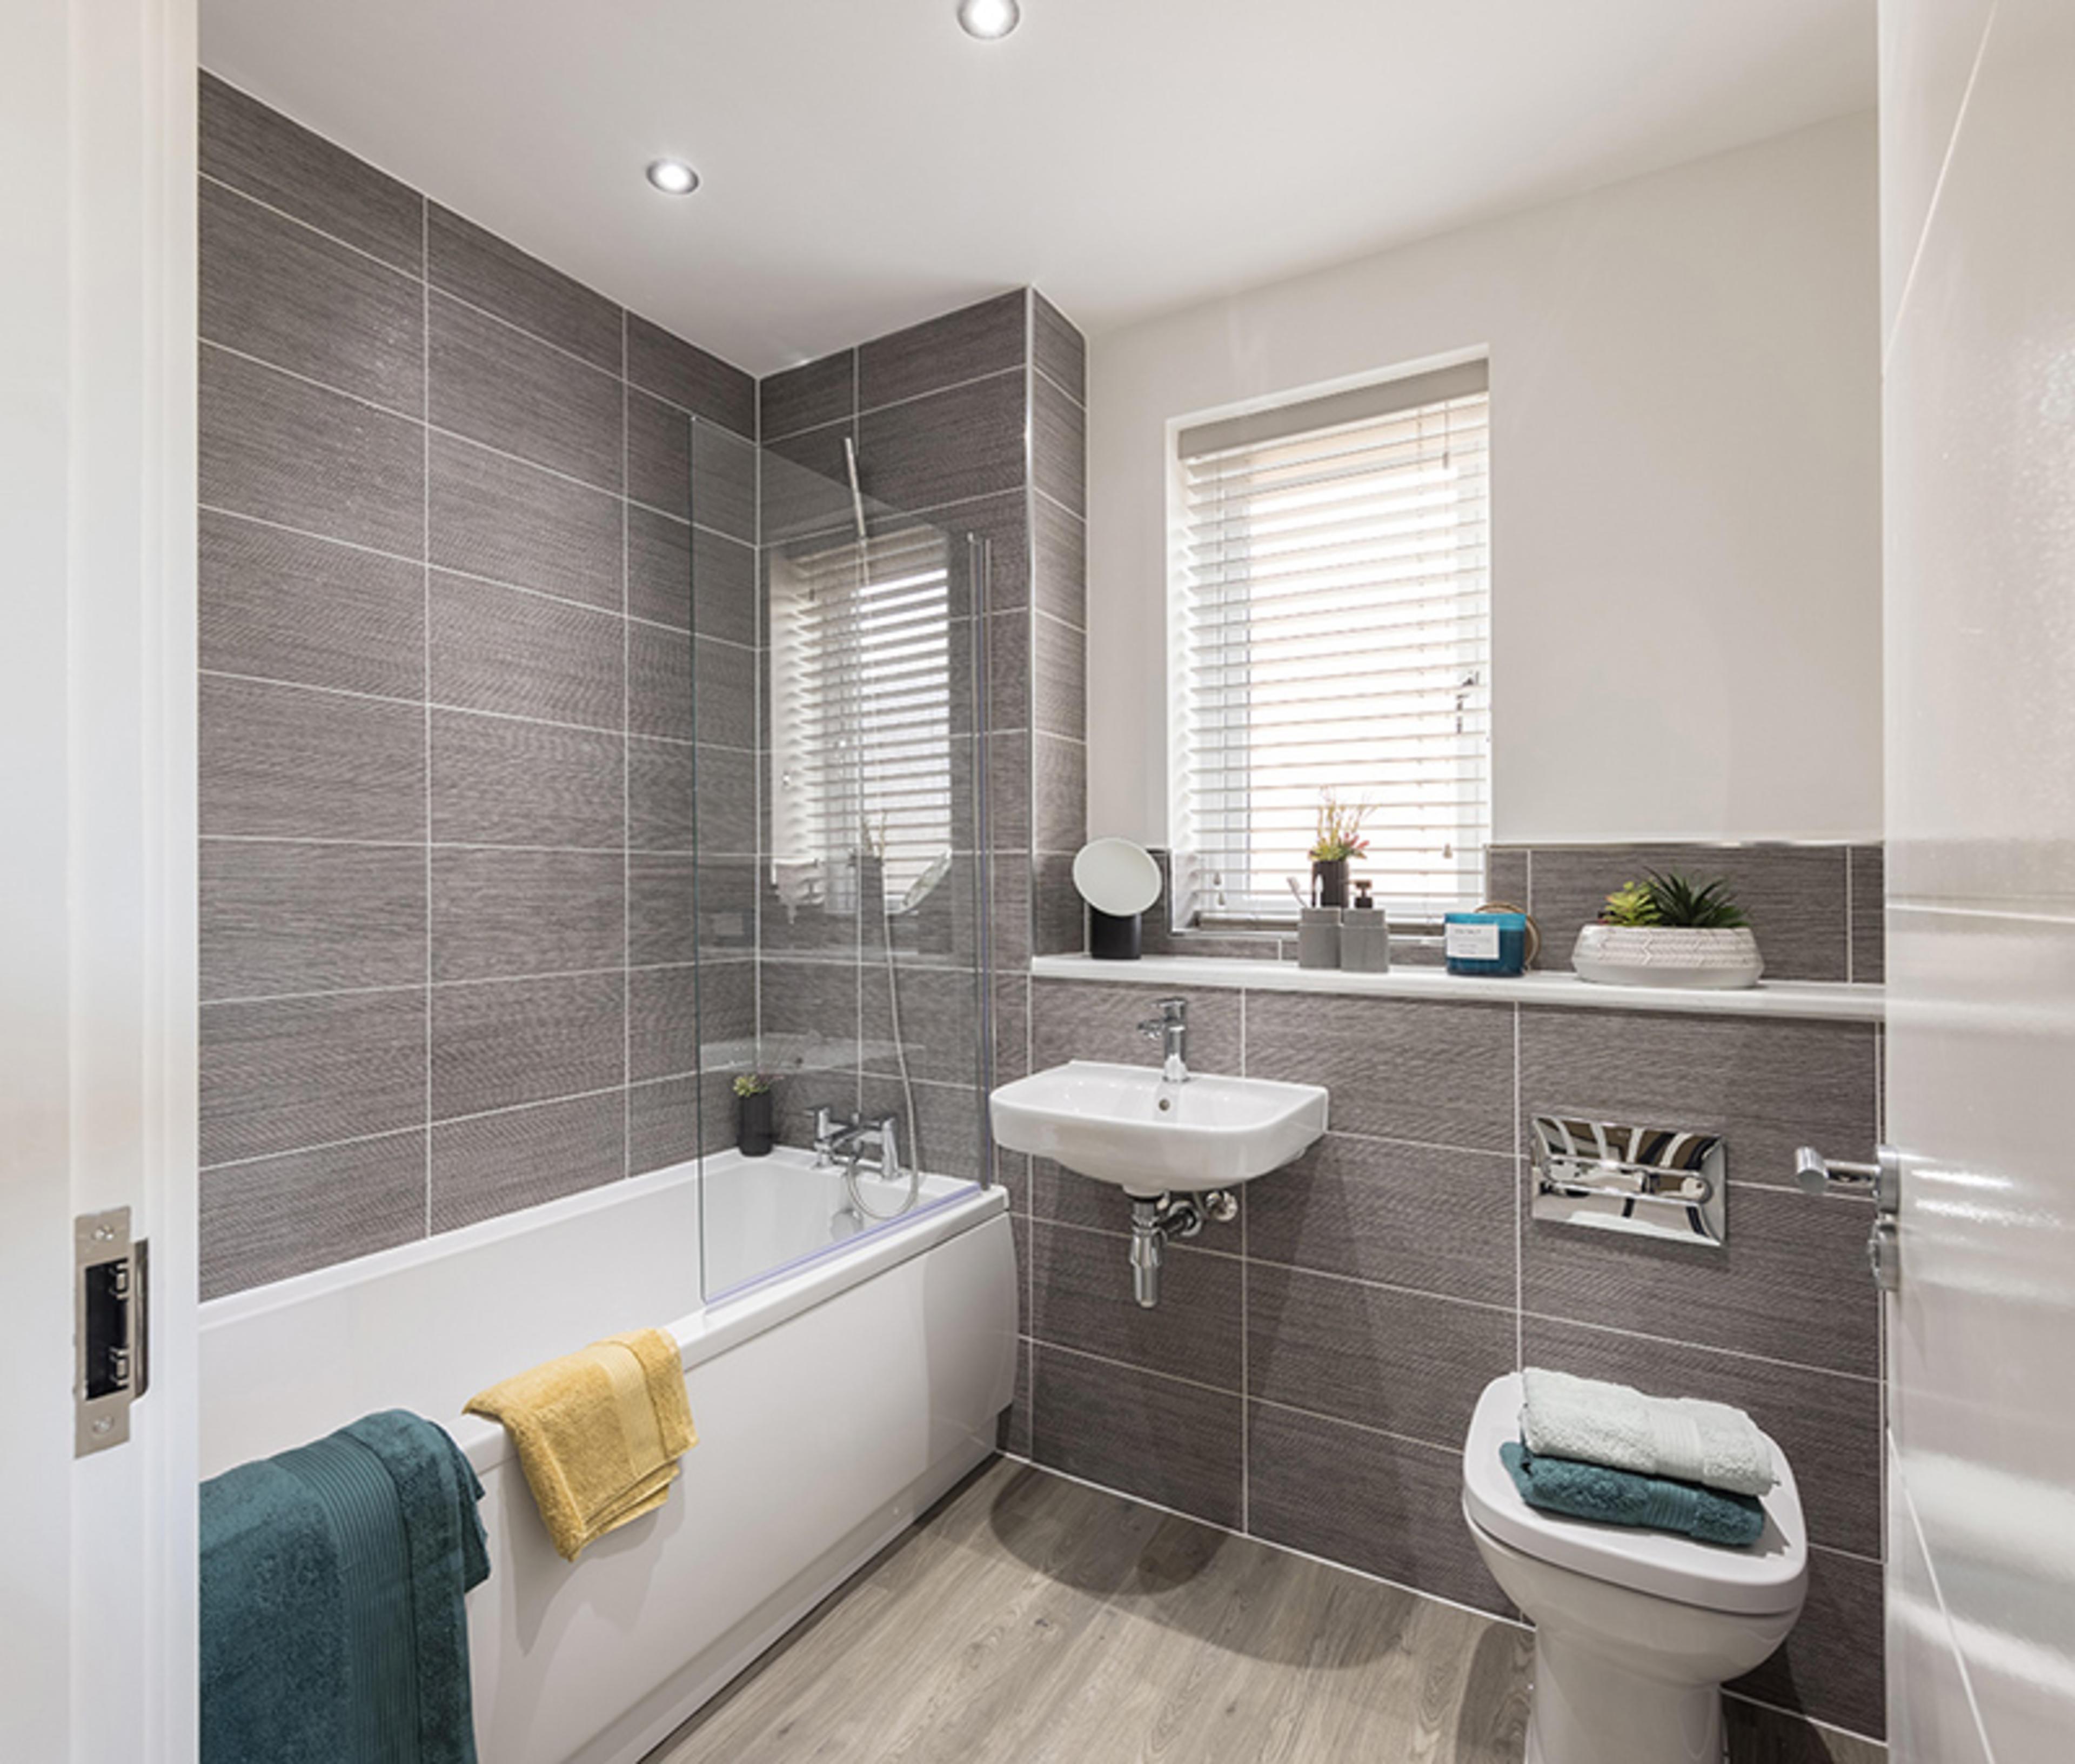 watling-grange-harrogate-easby-3-bed-home-bathroom-square-1